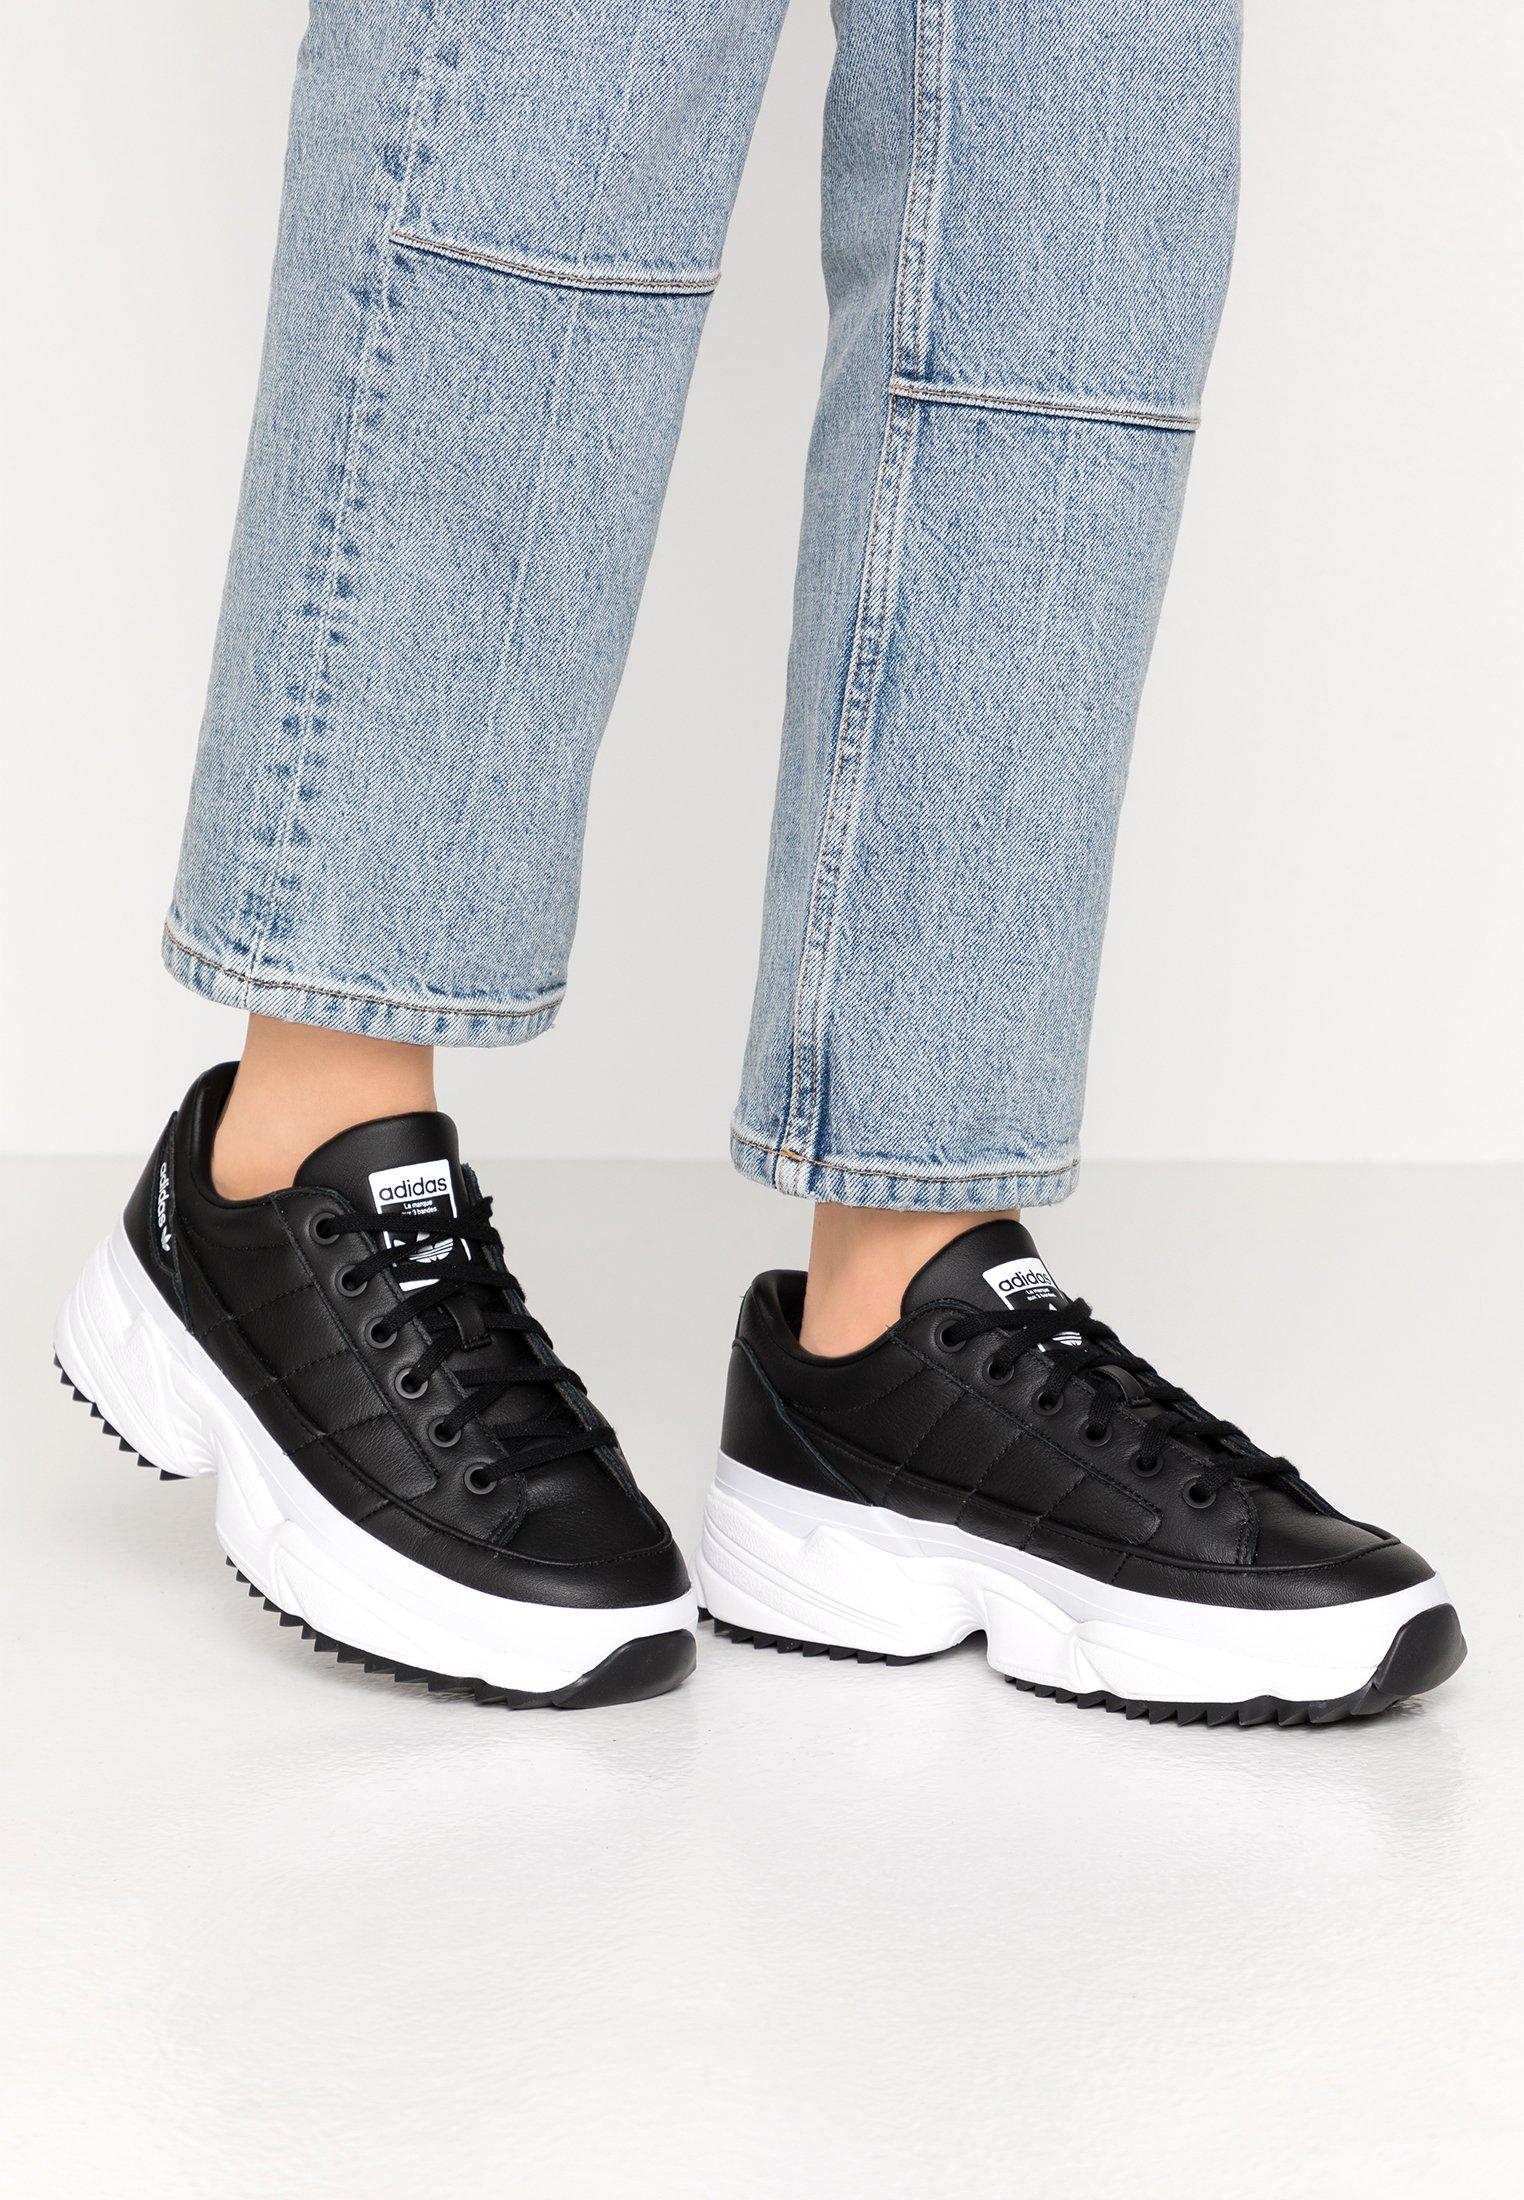 adidas Originals KIELLOR - Sneaker low - core black/footwear white | Damen Schuhe 2020